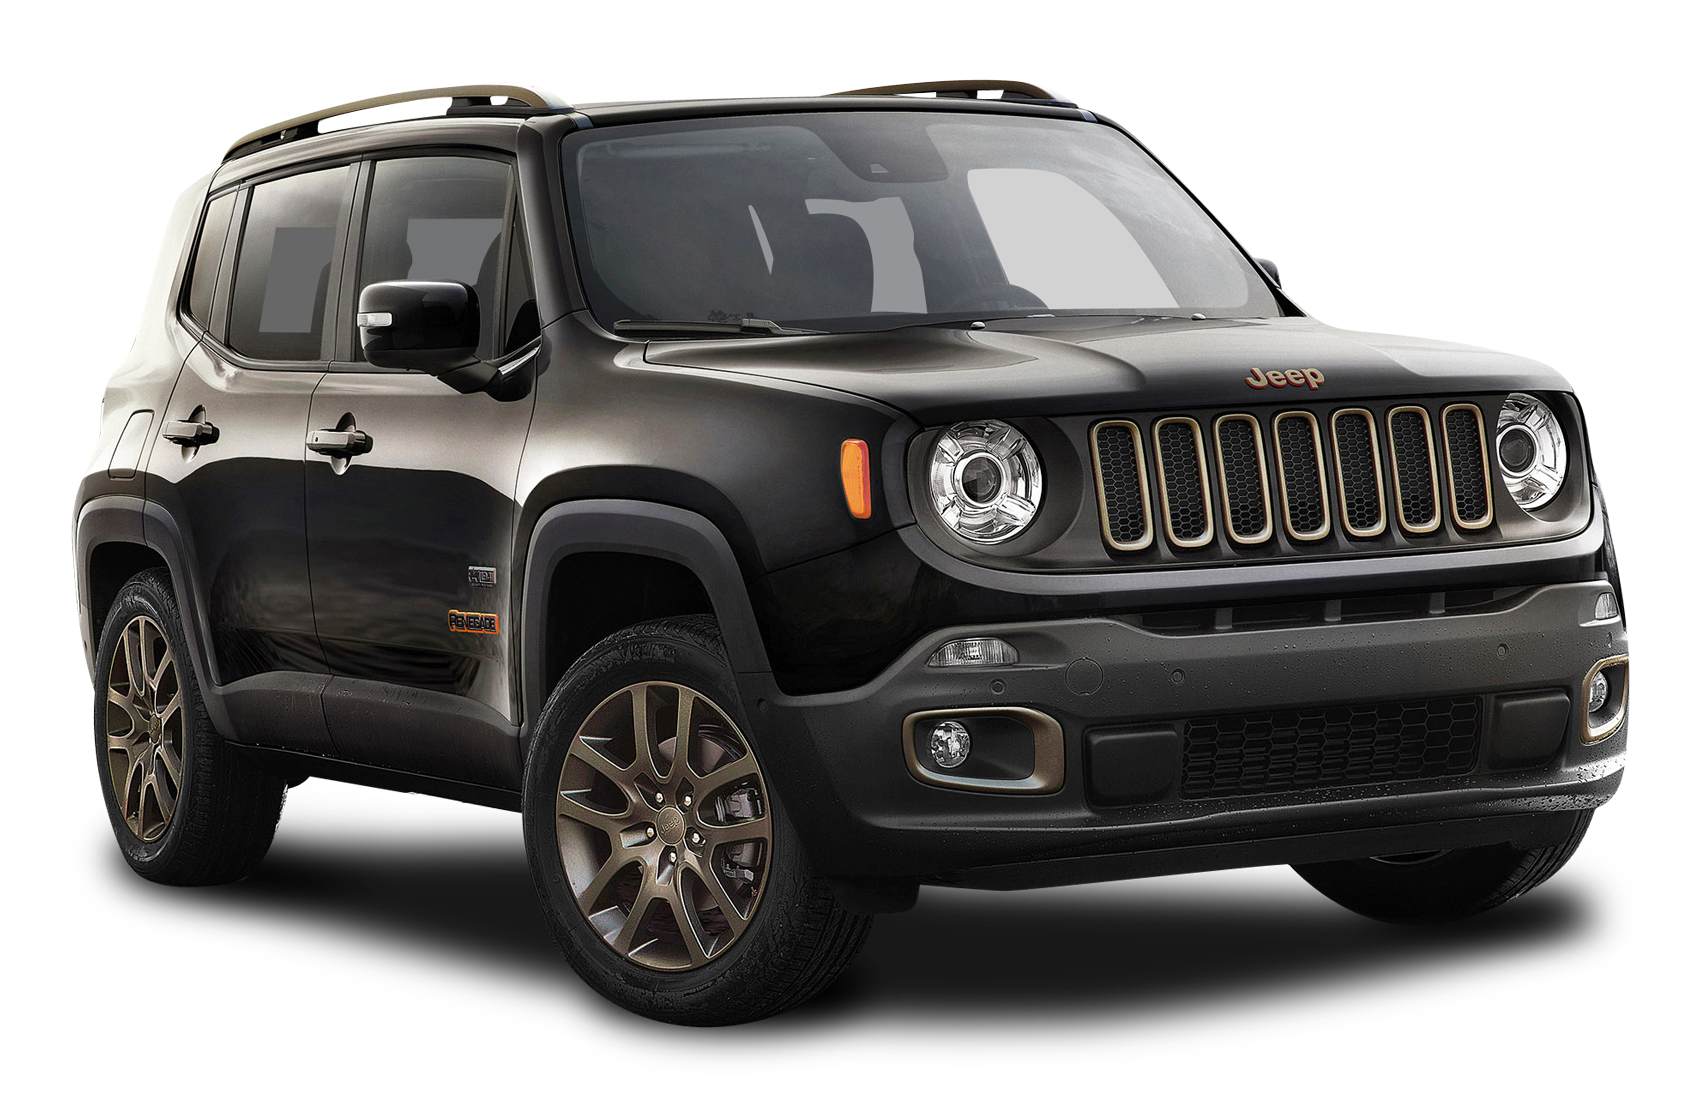 Car hood clipart jpg royalty free download Black Jeep Renegade Car PNG Image - PurePNG | Free transparent CC0 ... jpg royalty free download